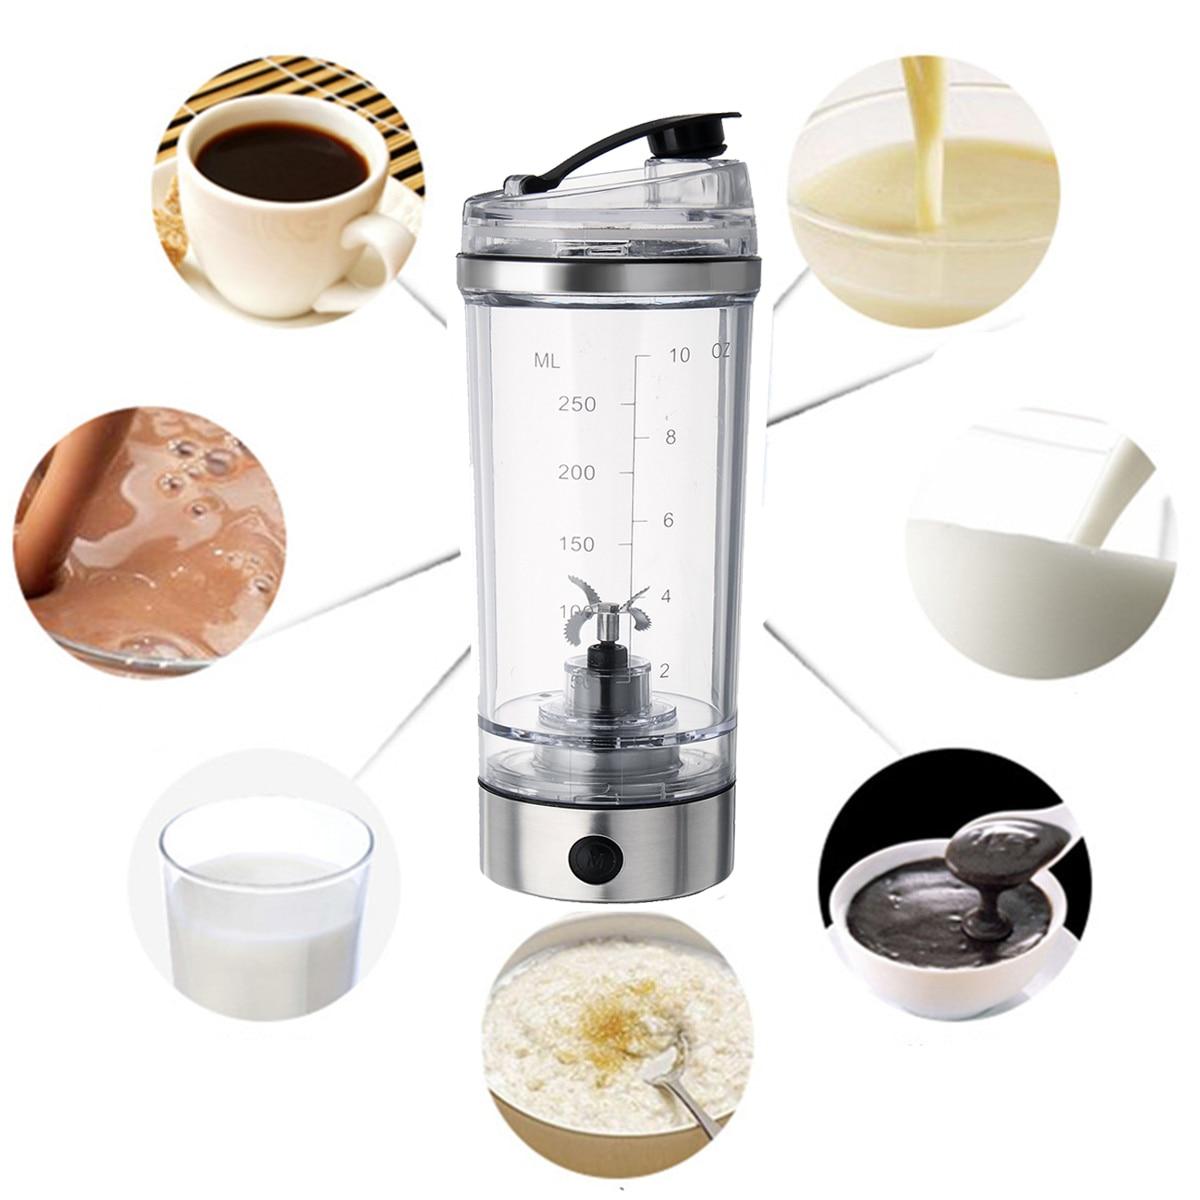 H30b08a46b00b4ca1ad3edb0f5236f322d 2019 250ML Electric Protein Shake Stirrer USB Shake Bottle Milk Coffee Blender Kettle Fitness Vortex Tornado Smart Mixer